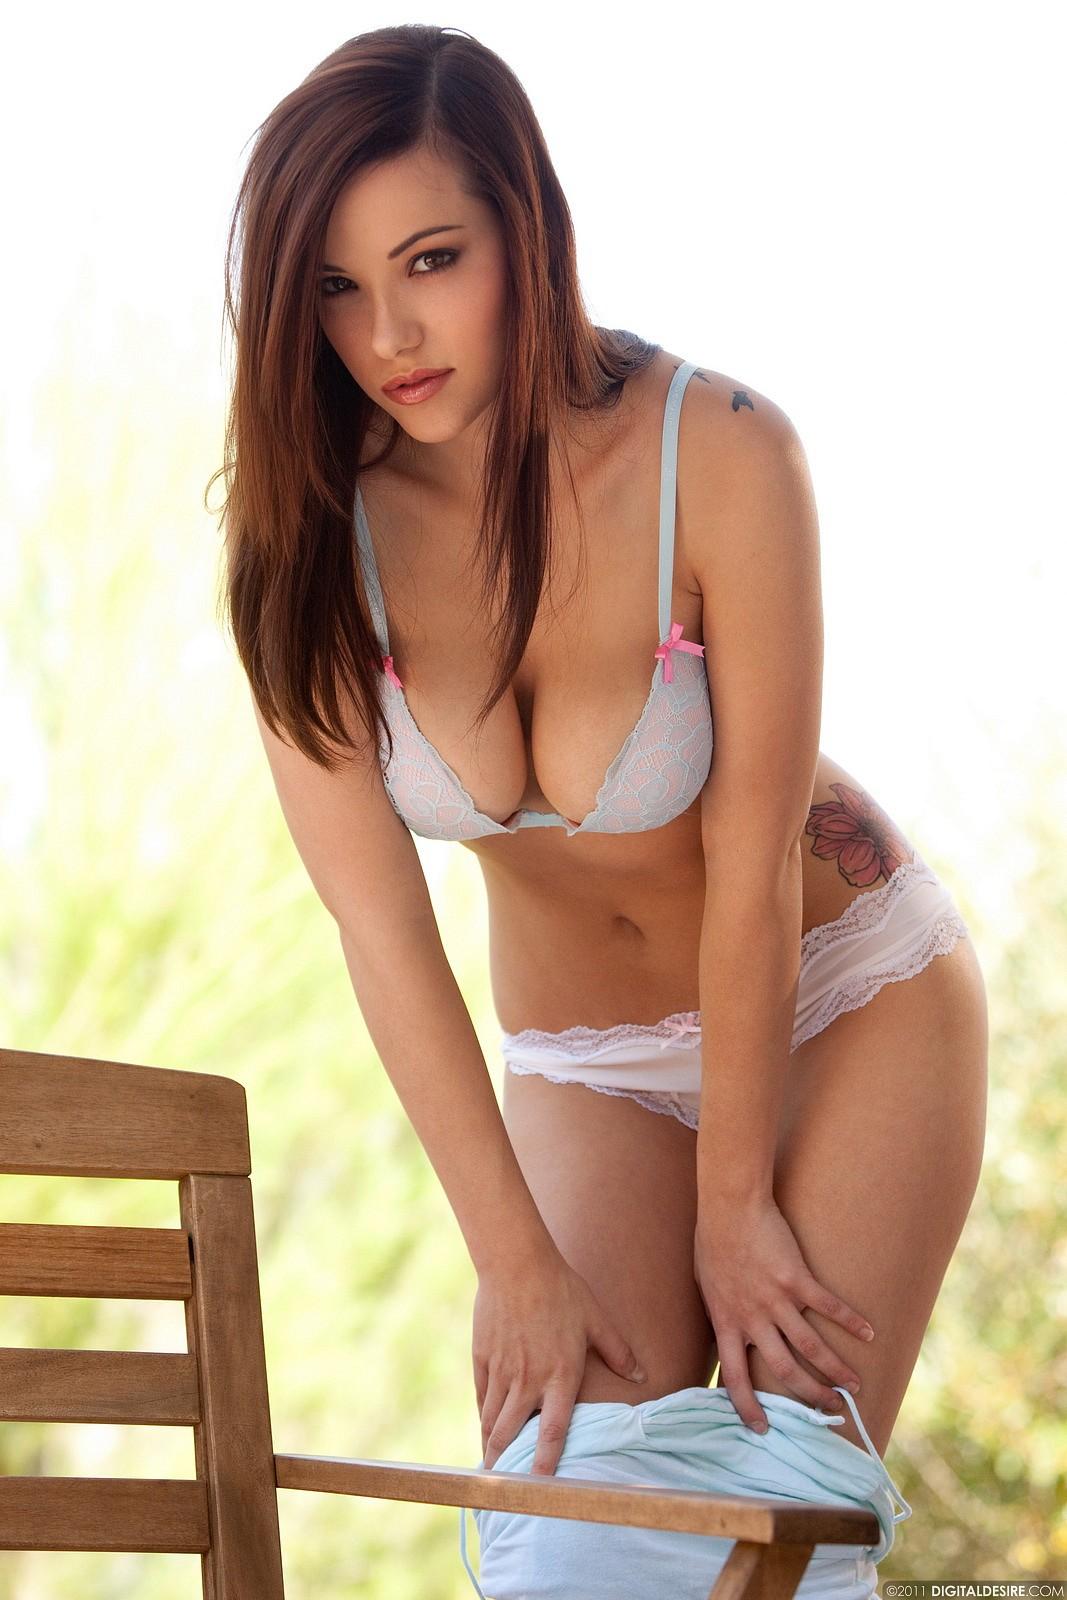 Sex Send Nudes Fuck Off Shirt Pic